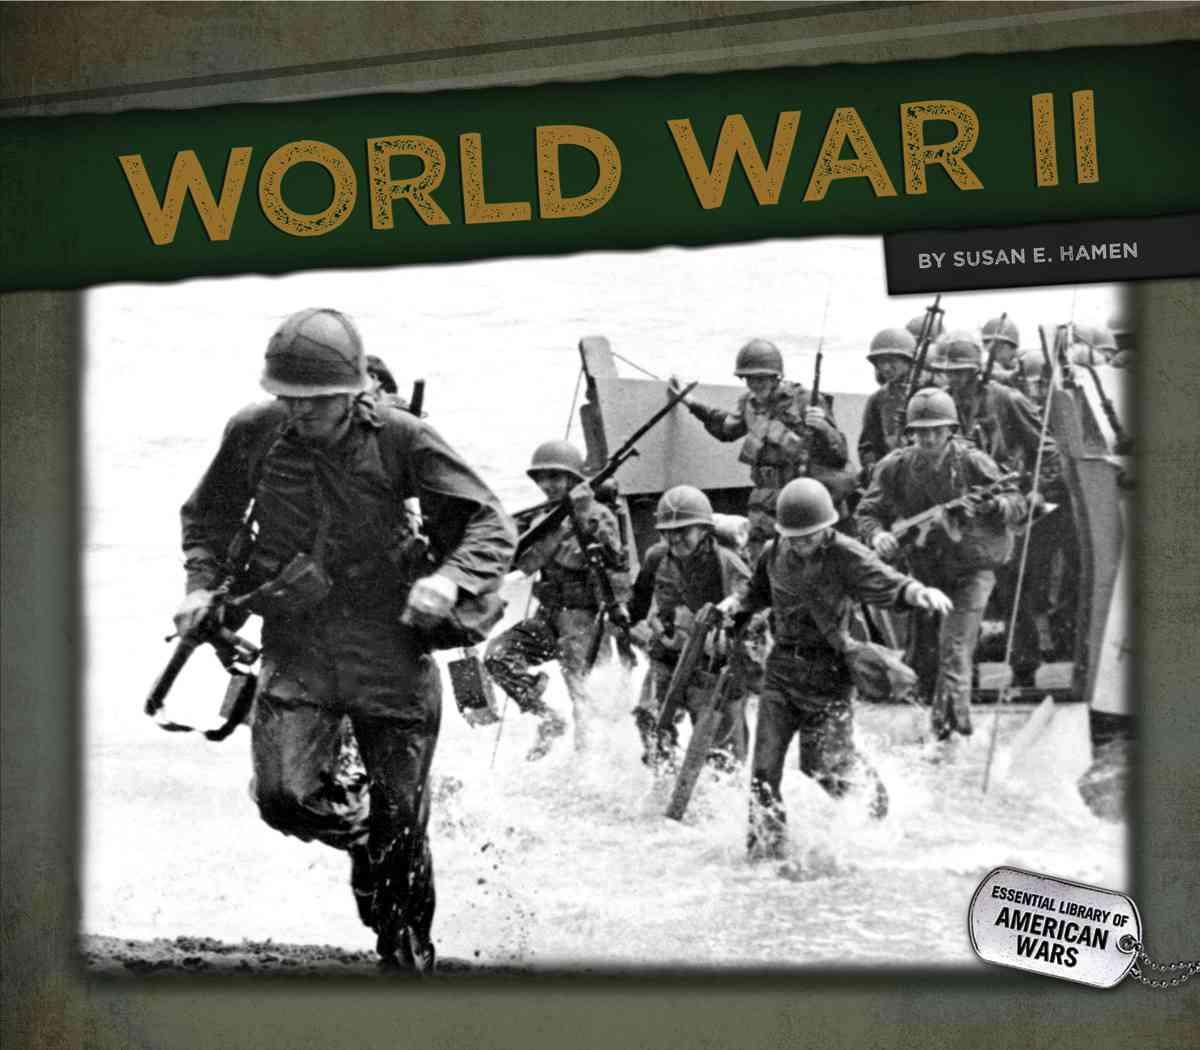 World War II By Hamen, Susan E.